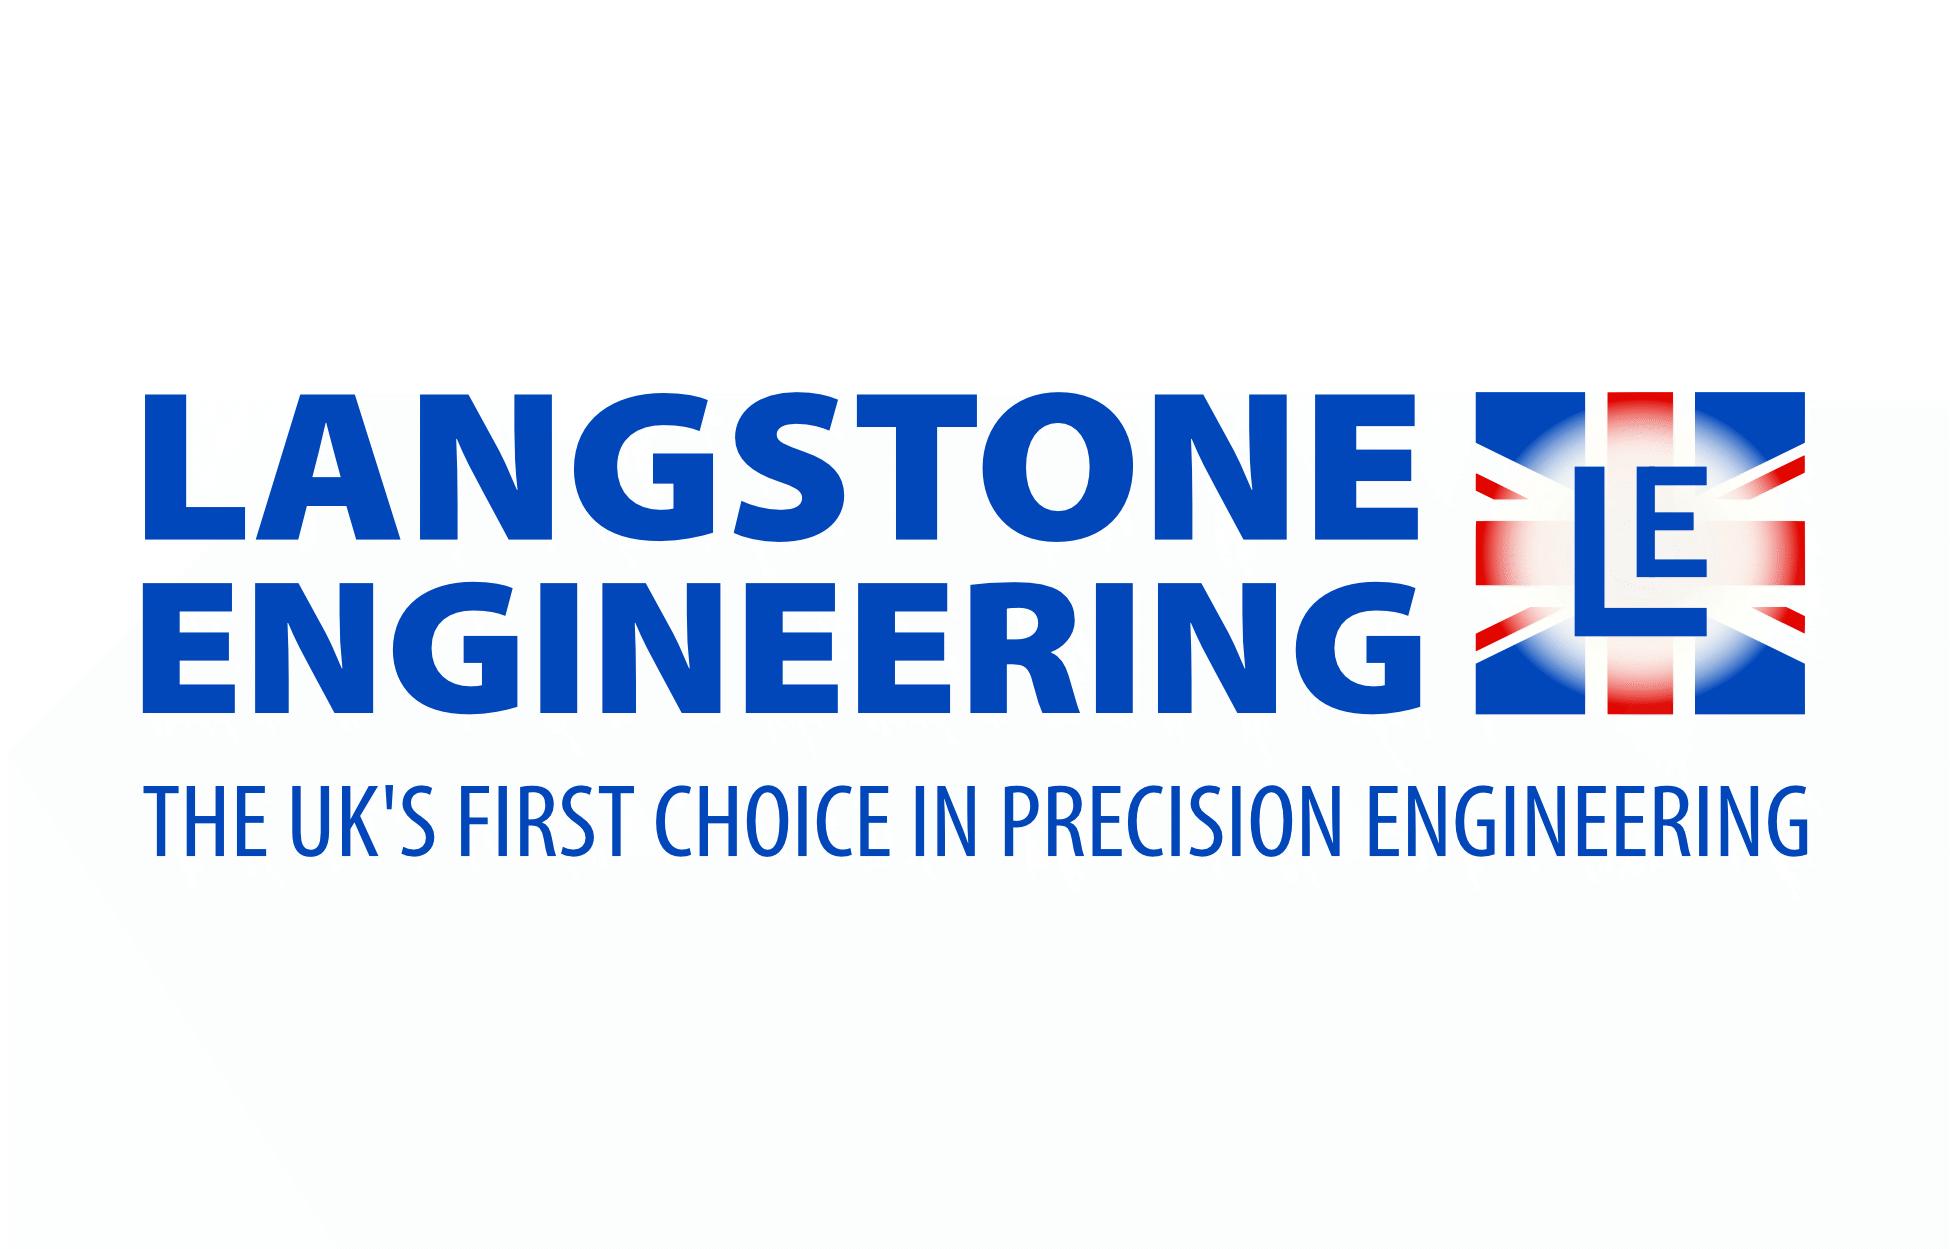 New Langstone Engineering Logo